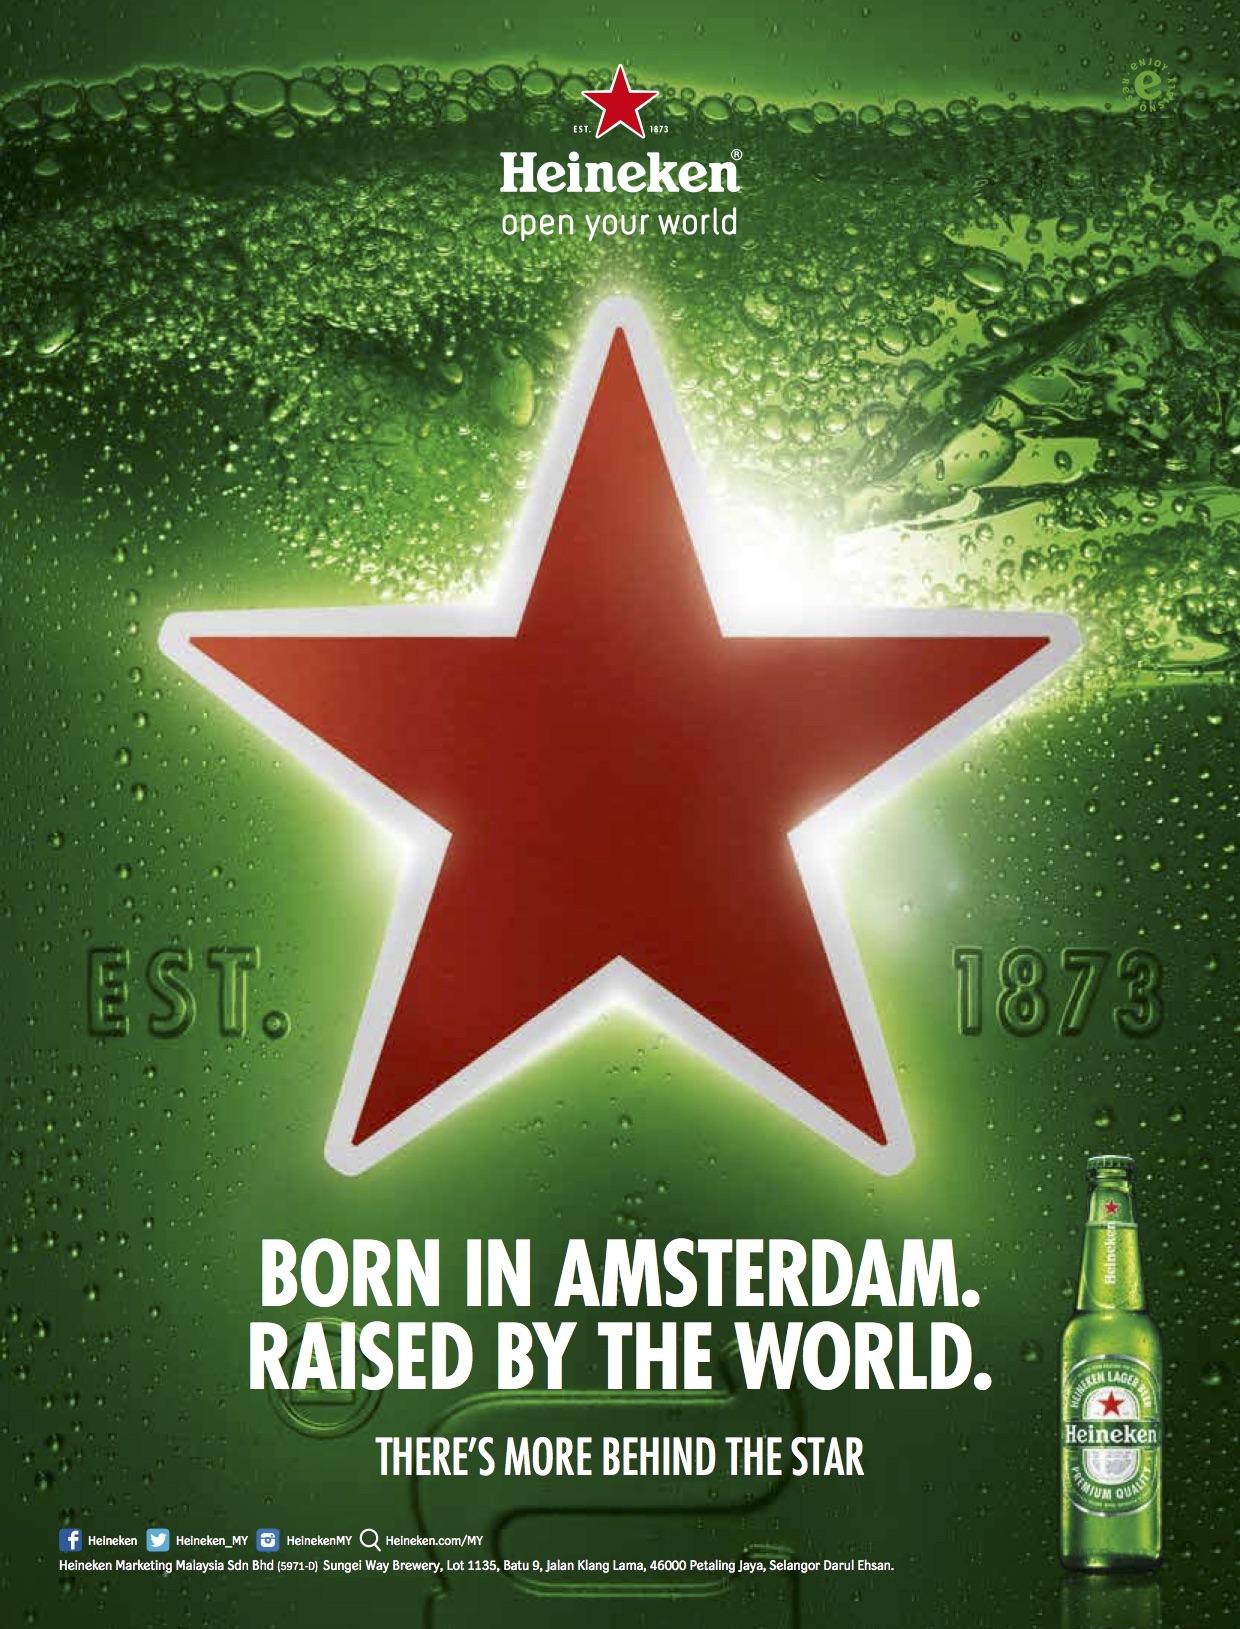 Image from Heineken